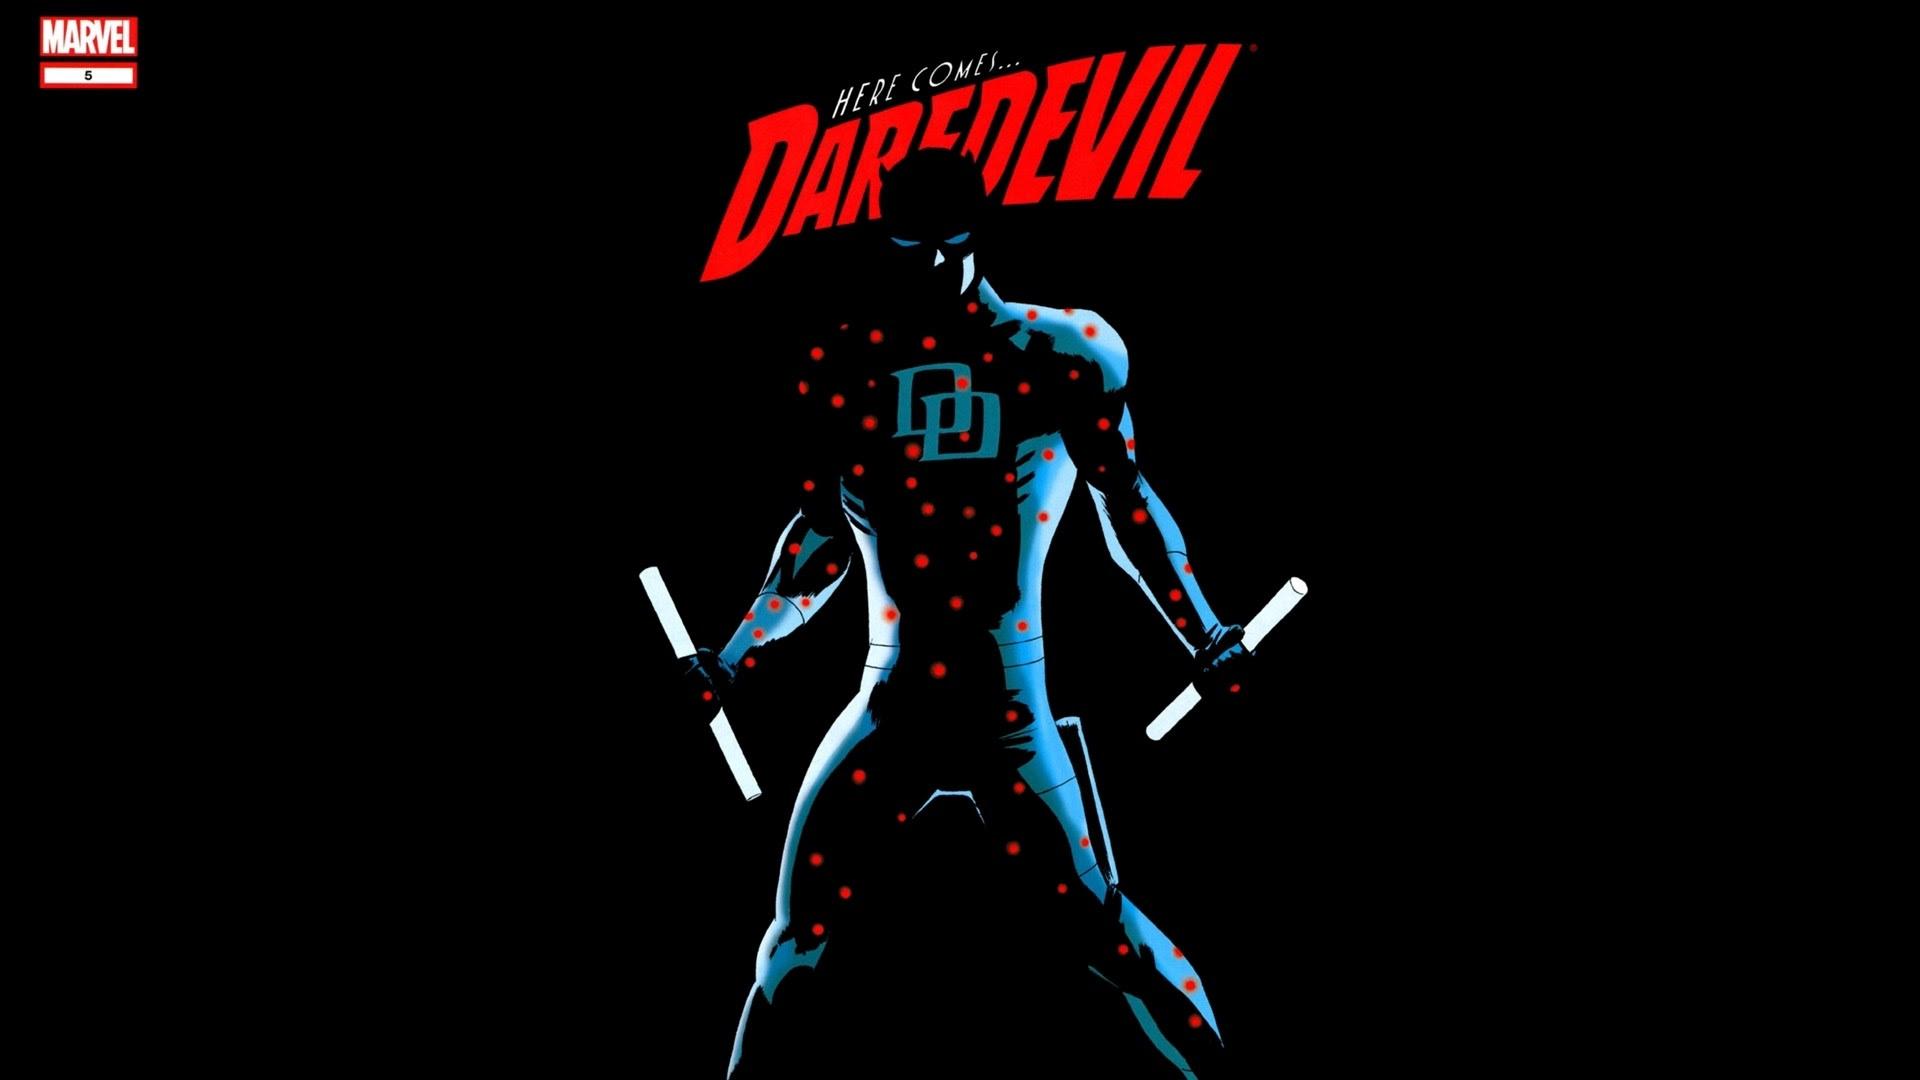 Daredevil iPhone Wallpaper (71+ images)